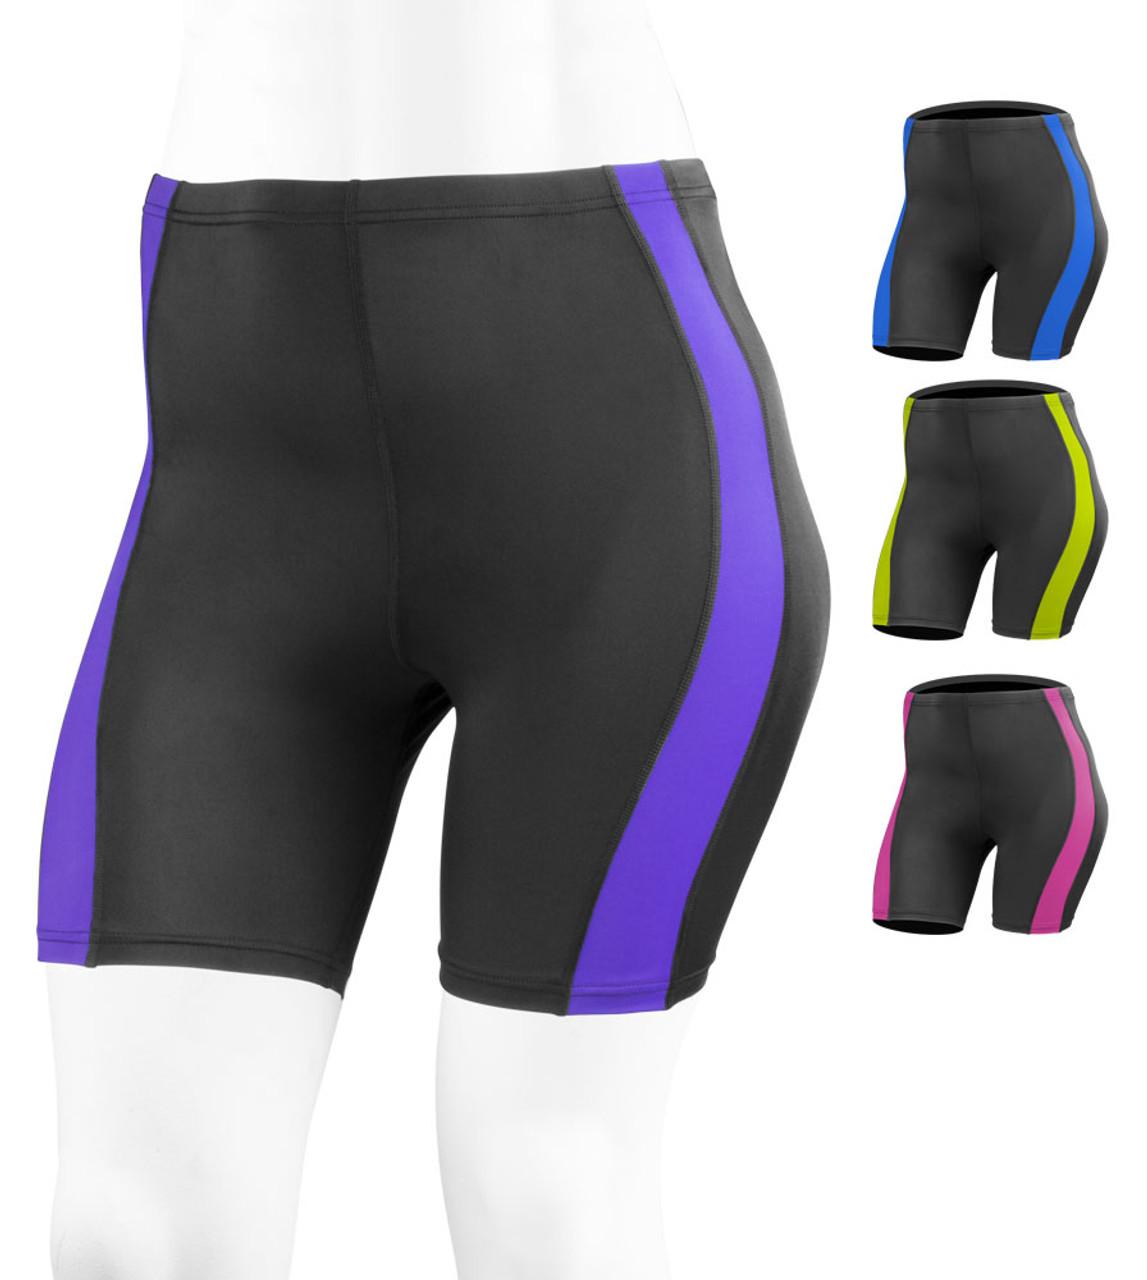 ec6b384a02 ... Women's Compression Fitness Shorts - Classic 2.0. Aero Tech Designs